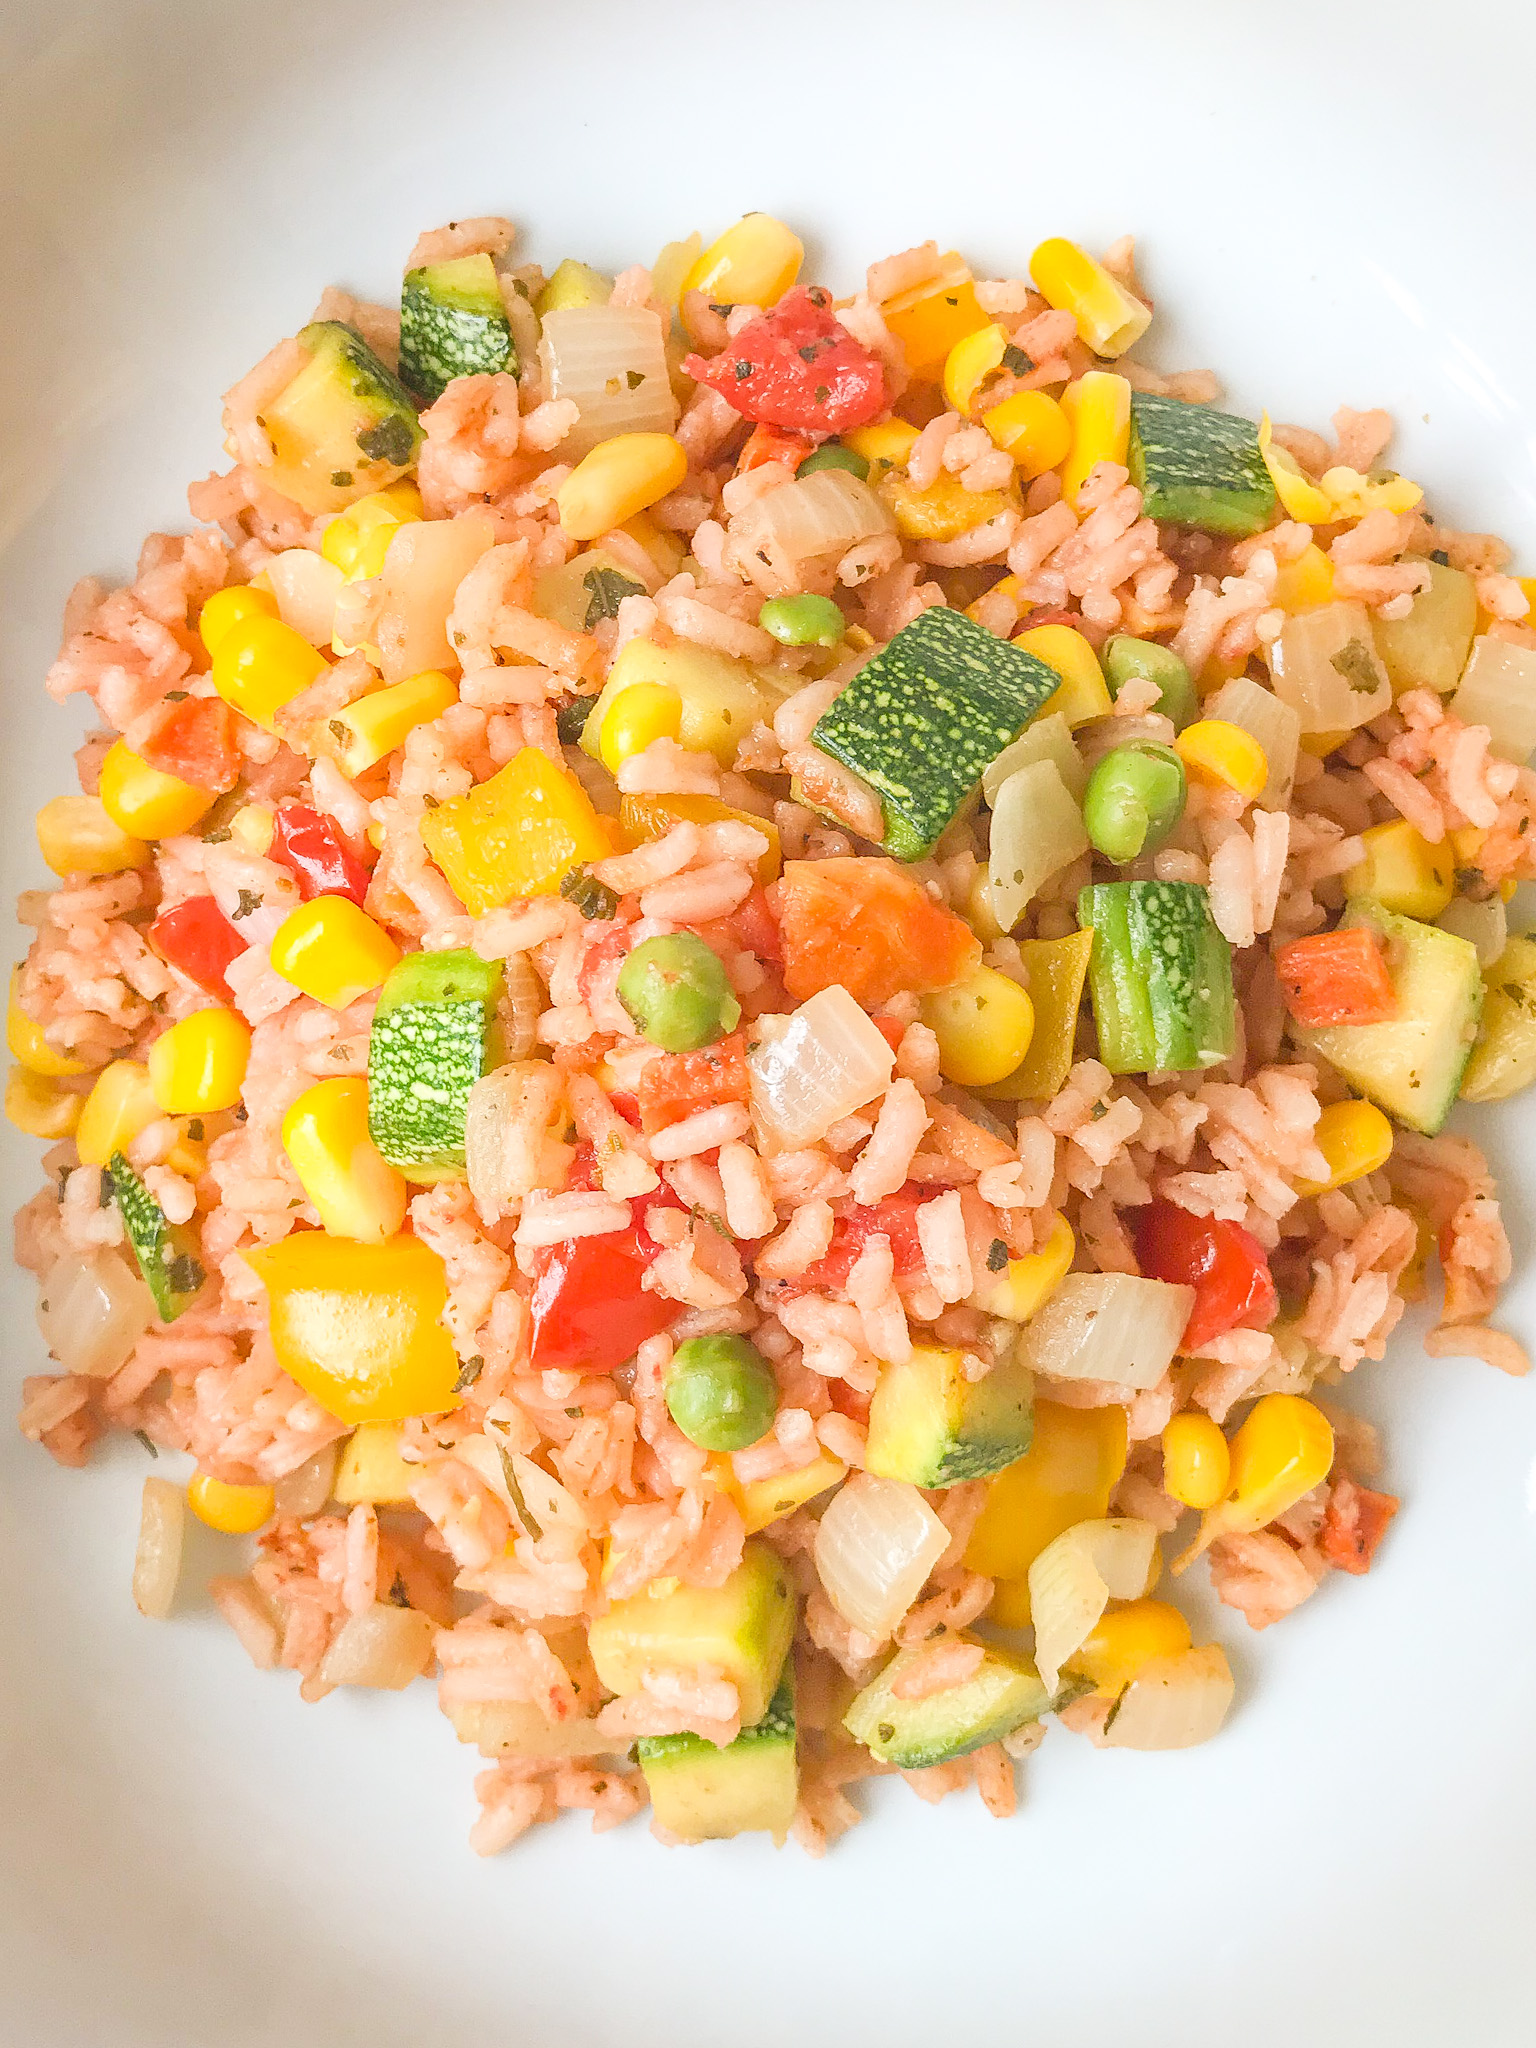 Vegetarian Mexican Skillet Meal